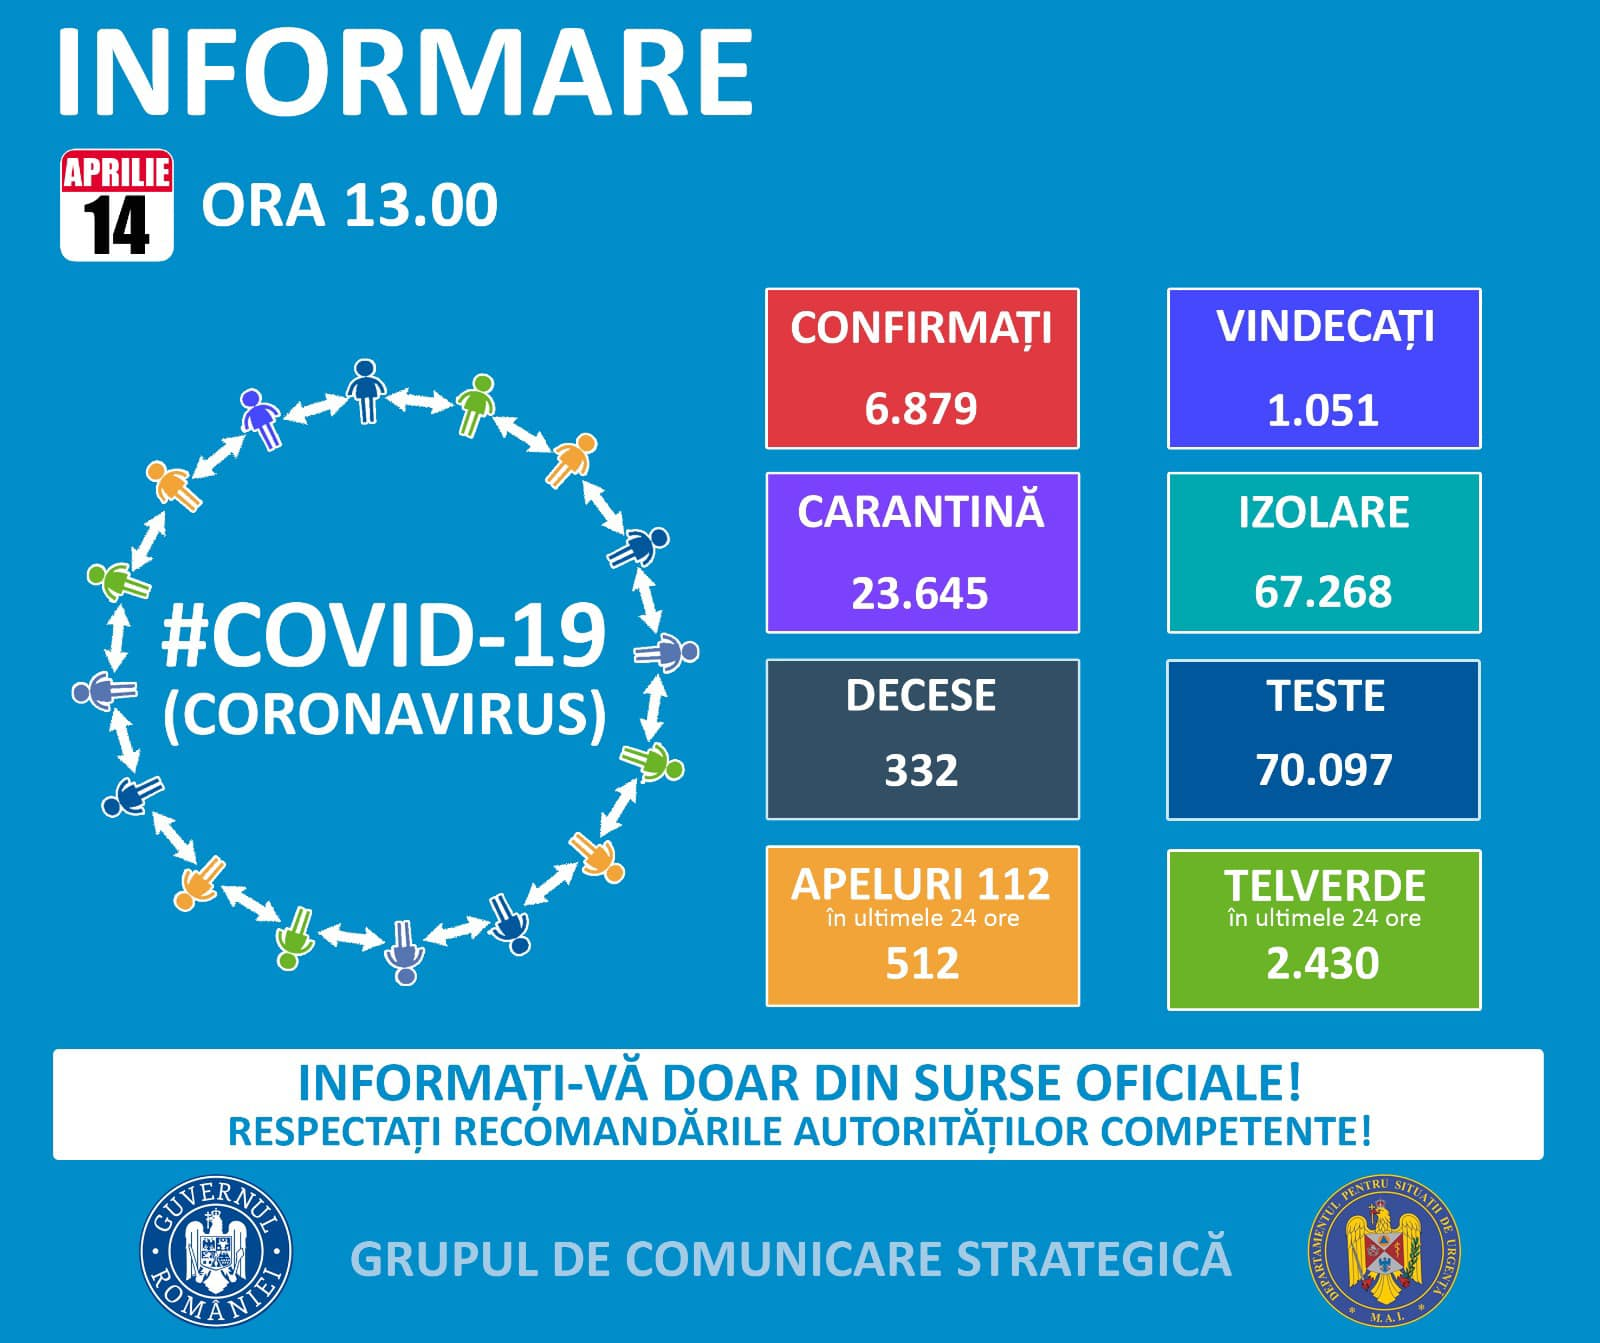 Coronavirus Romania situatie 14 aprilie 2020